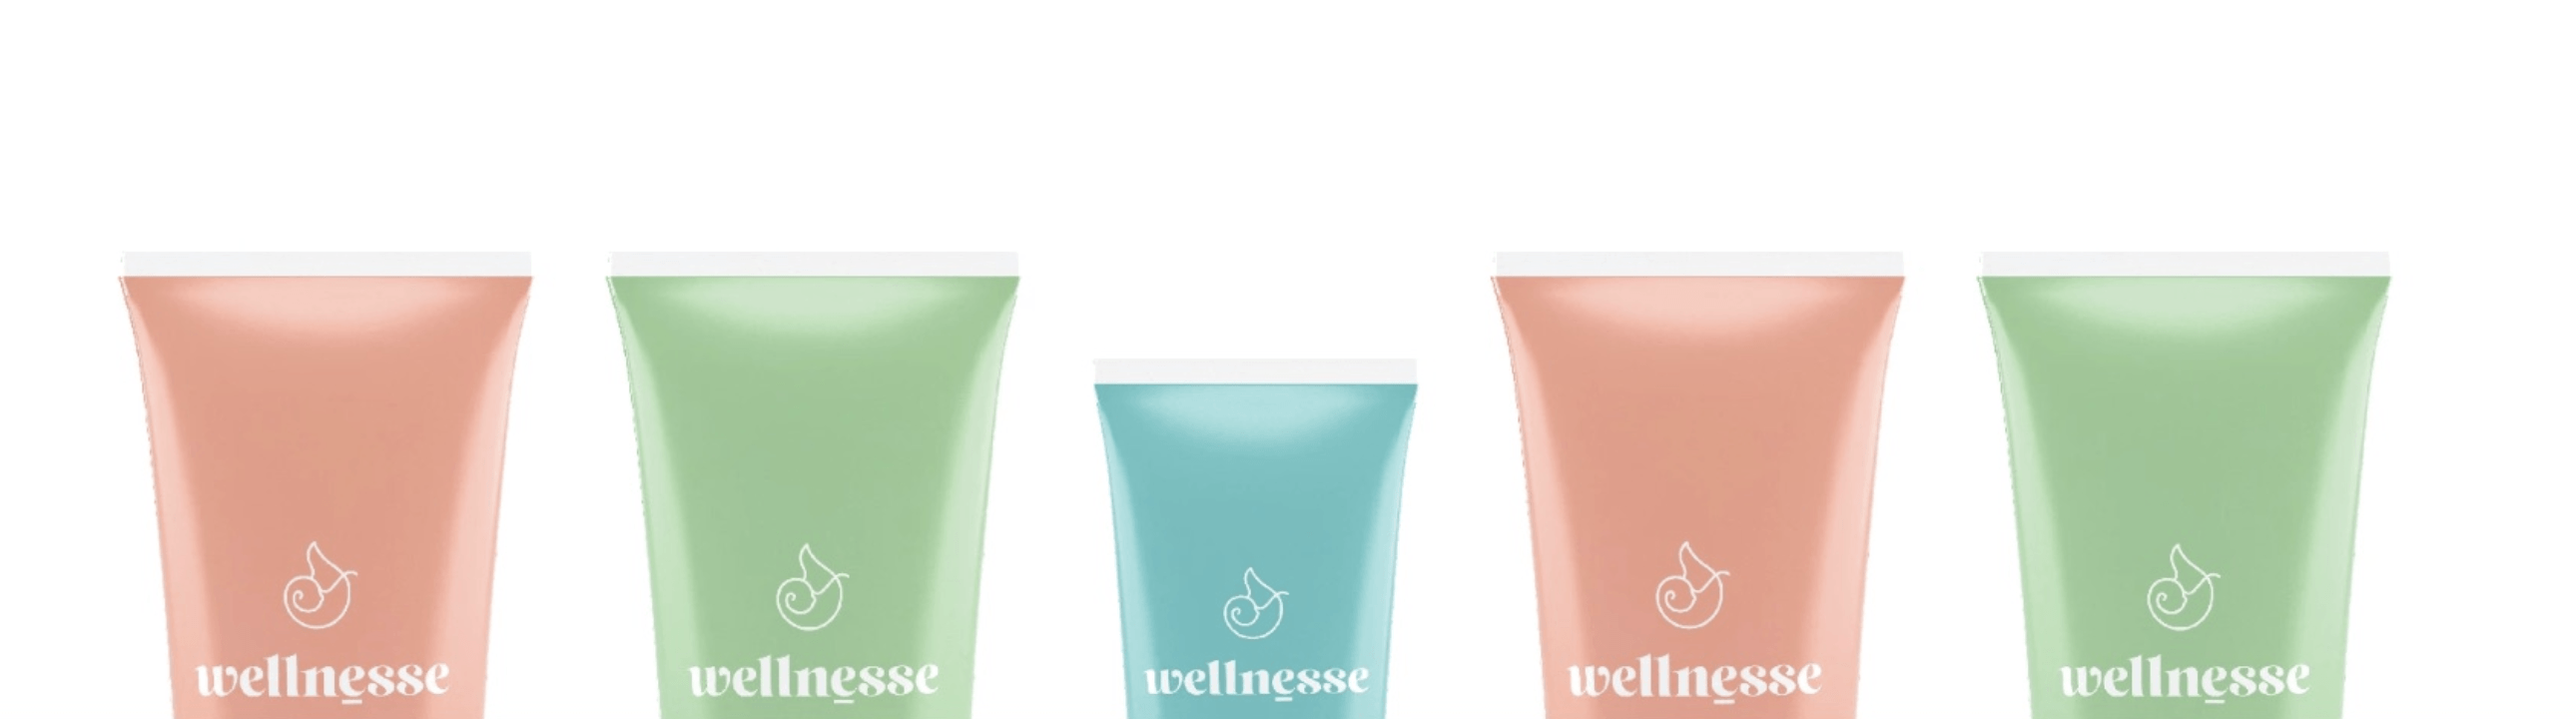 Product shot of Wellnesse